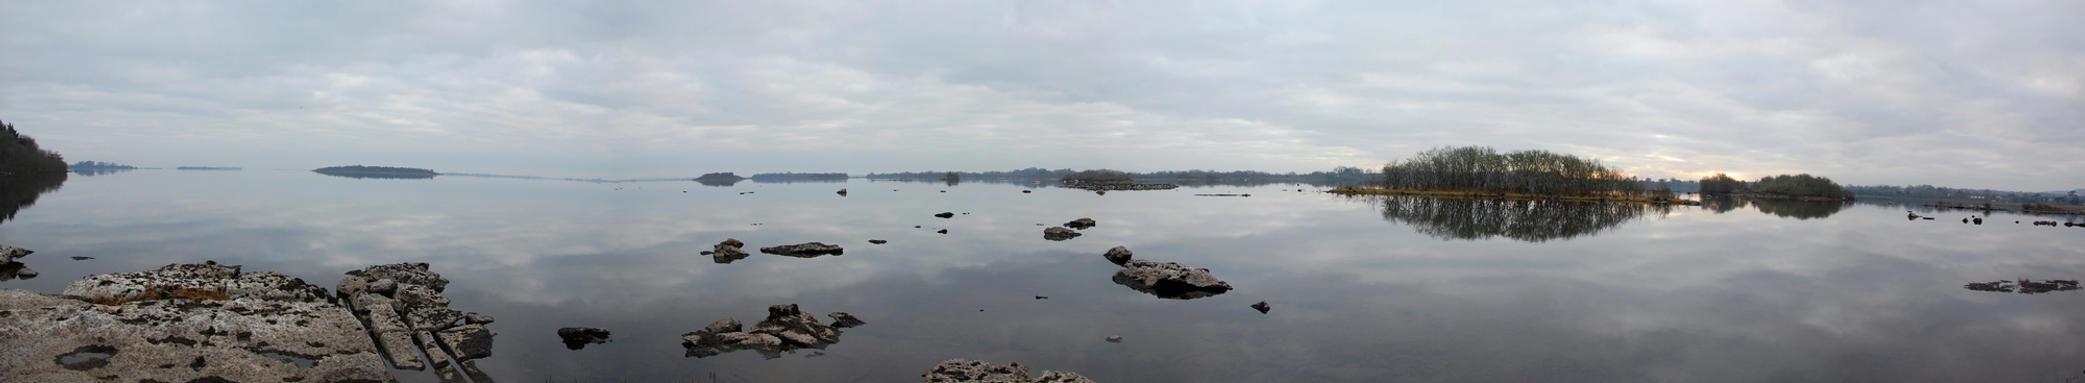 Lough Corrib Panorama by ironmanbr